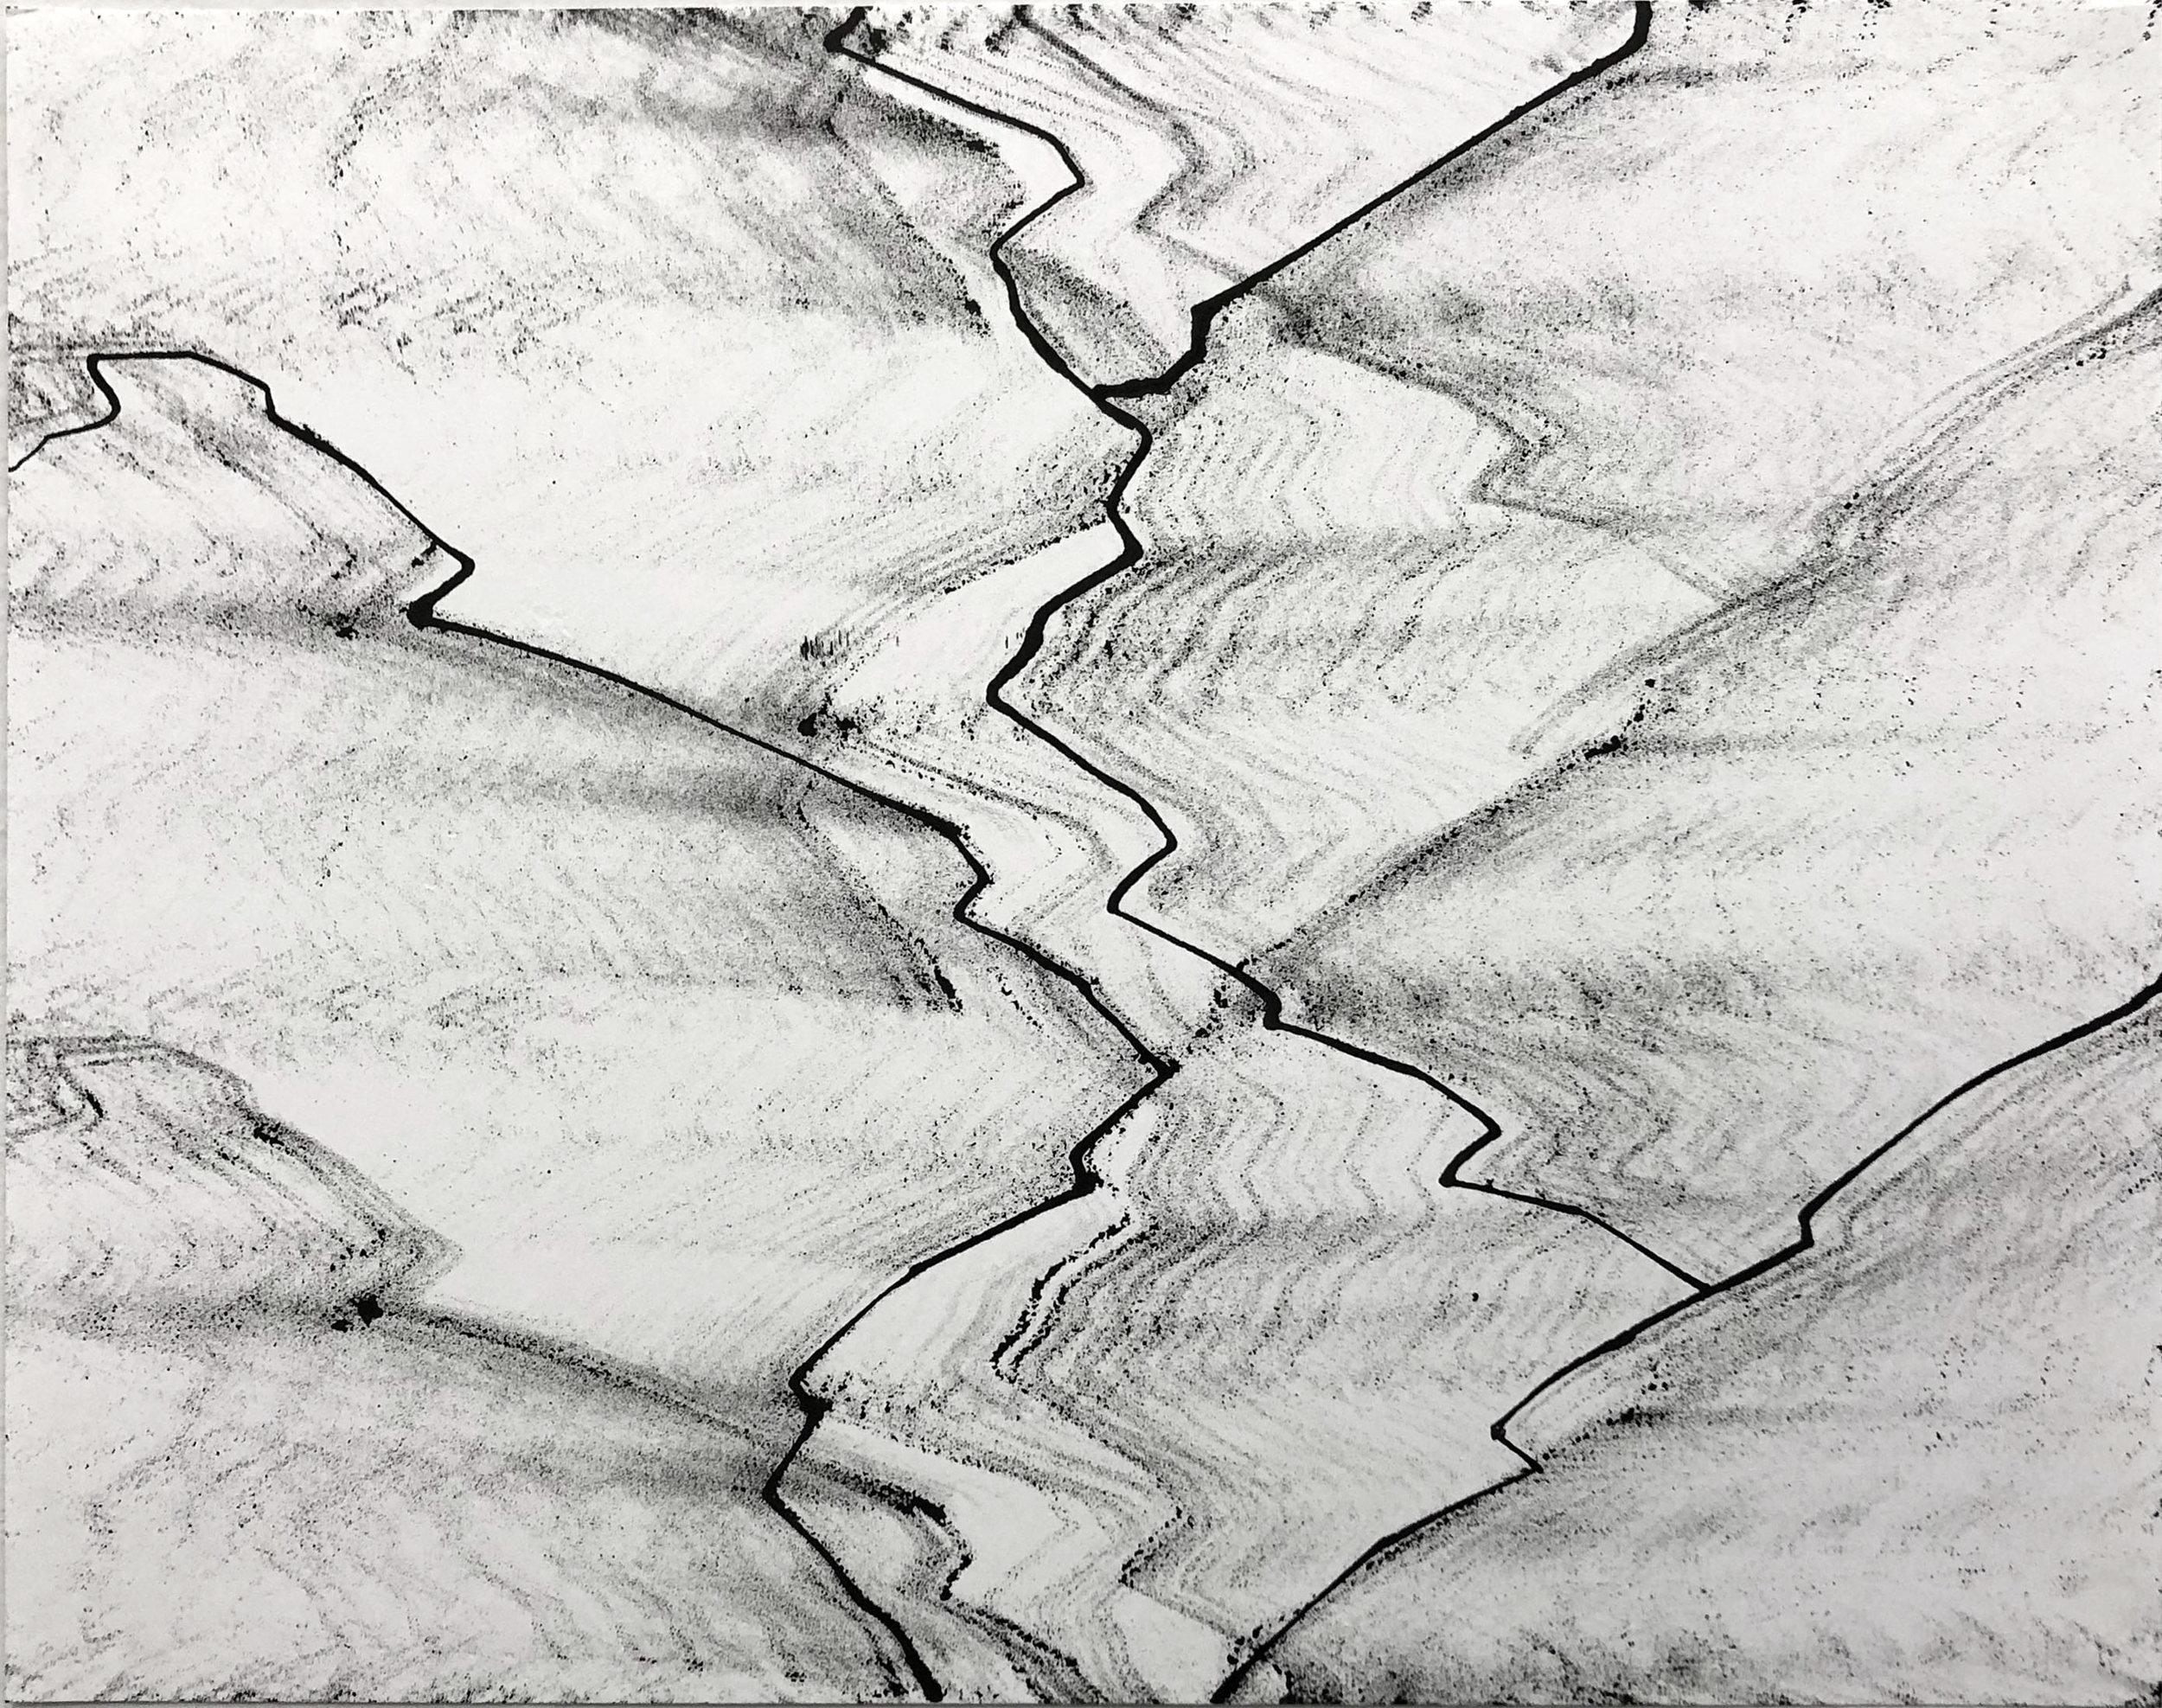 Bzr, 11x14, Ink on Paper